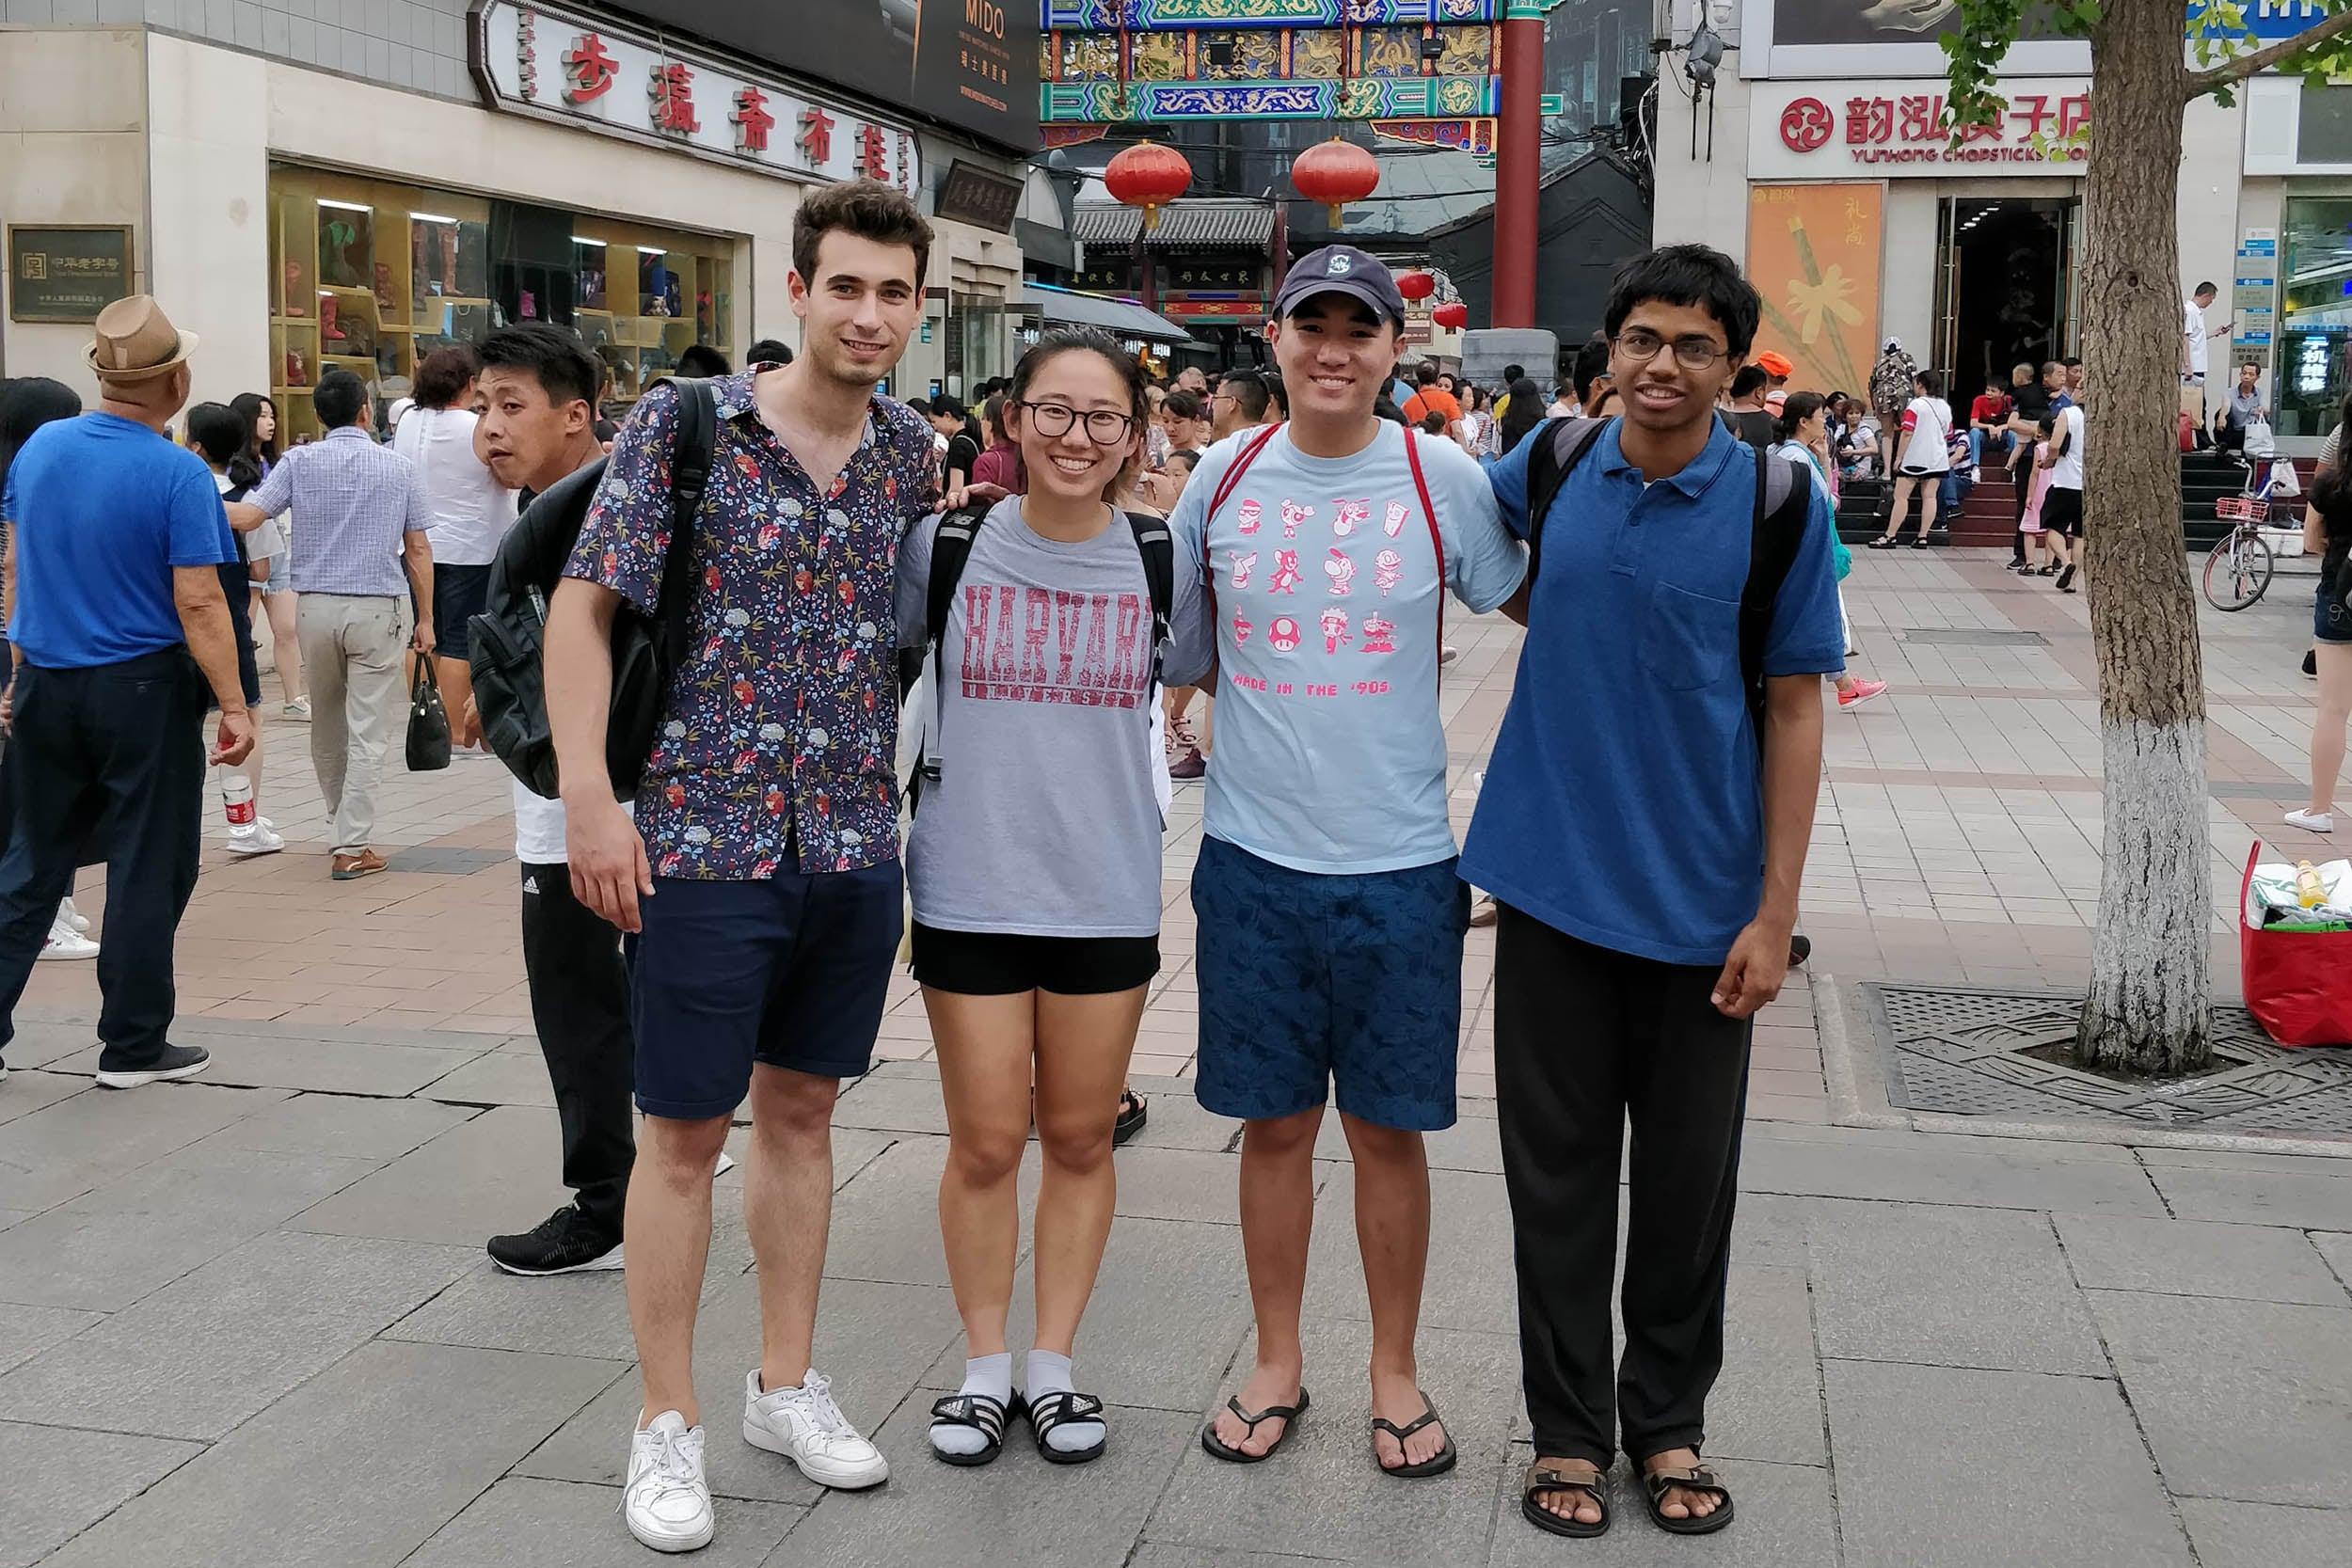 Harvard undergraduates Andrei Iliescu (from left), Irene Lu, Caleb Ren, and Adytia Mahadevan enjoy sightseeing on a cultural trip to Dong Hua Men Market.